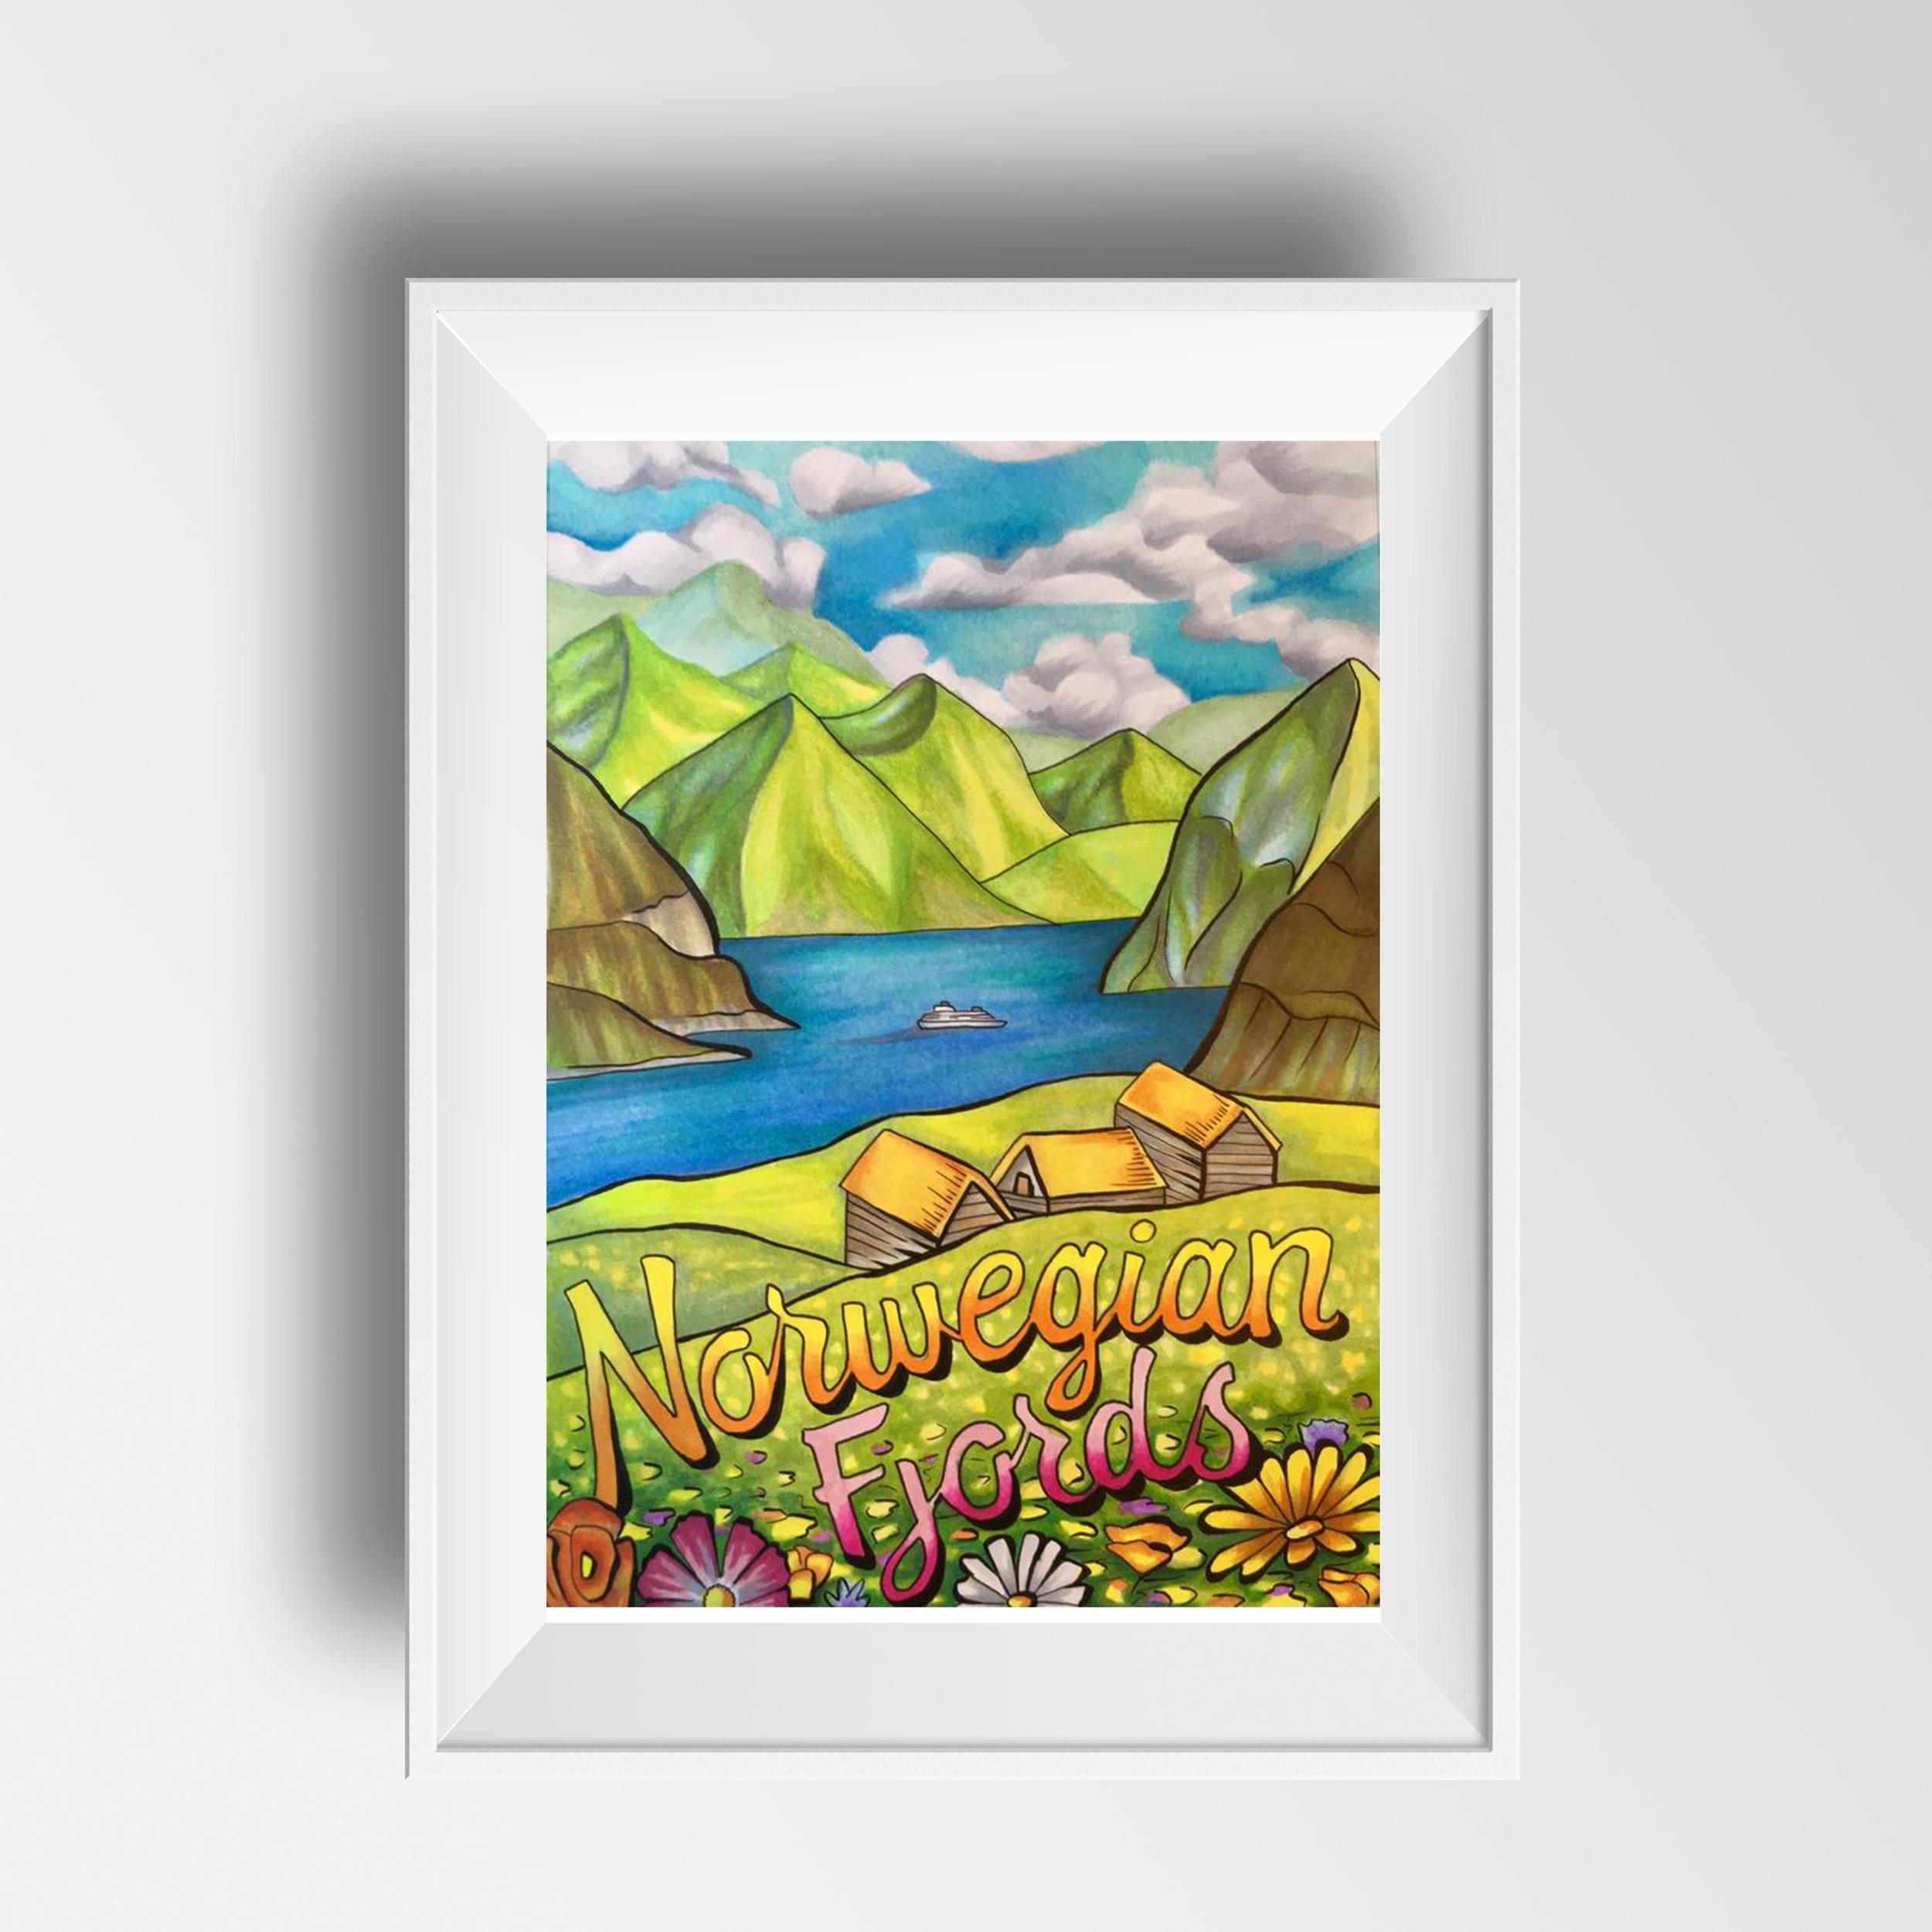 fjords_framed_to-use.jpg